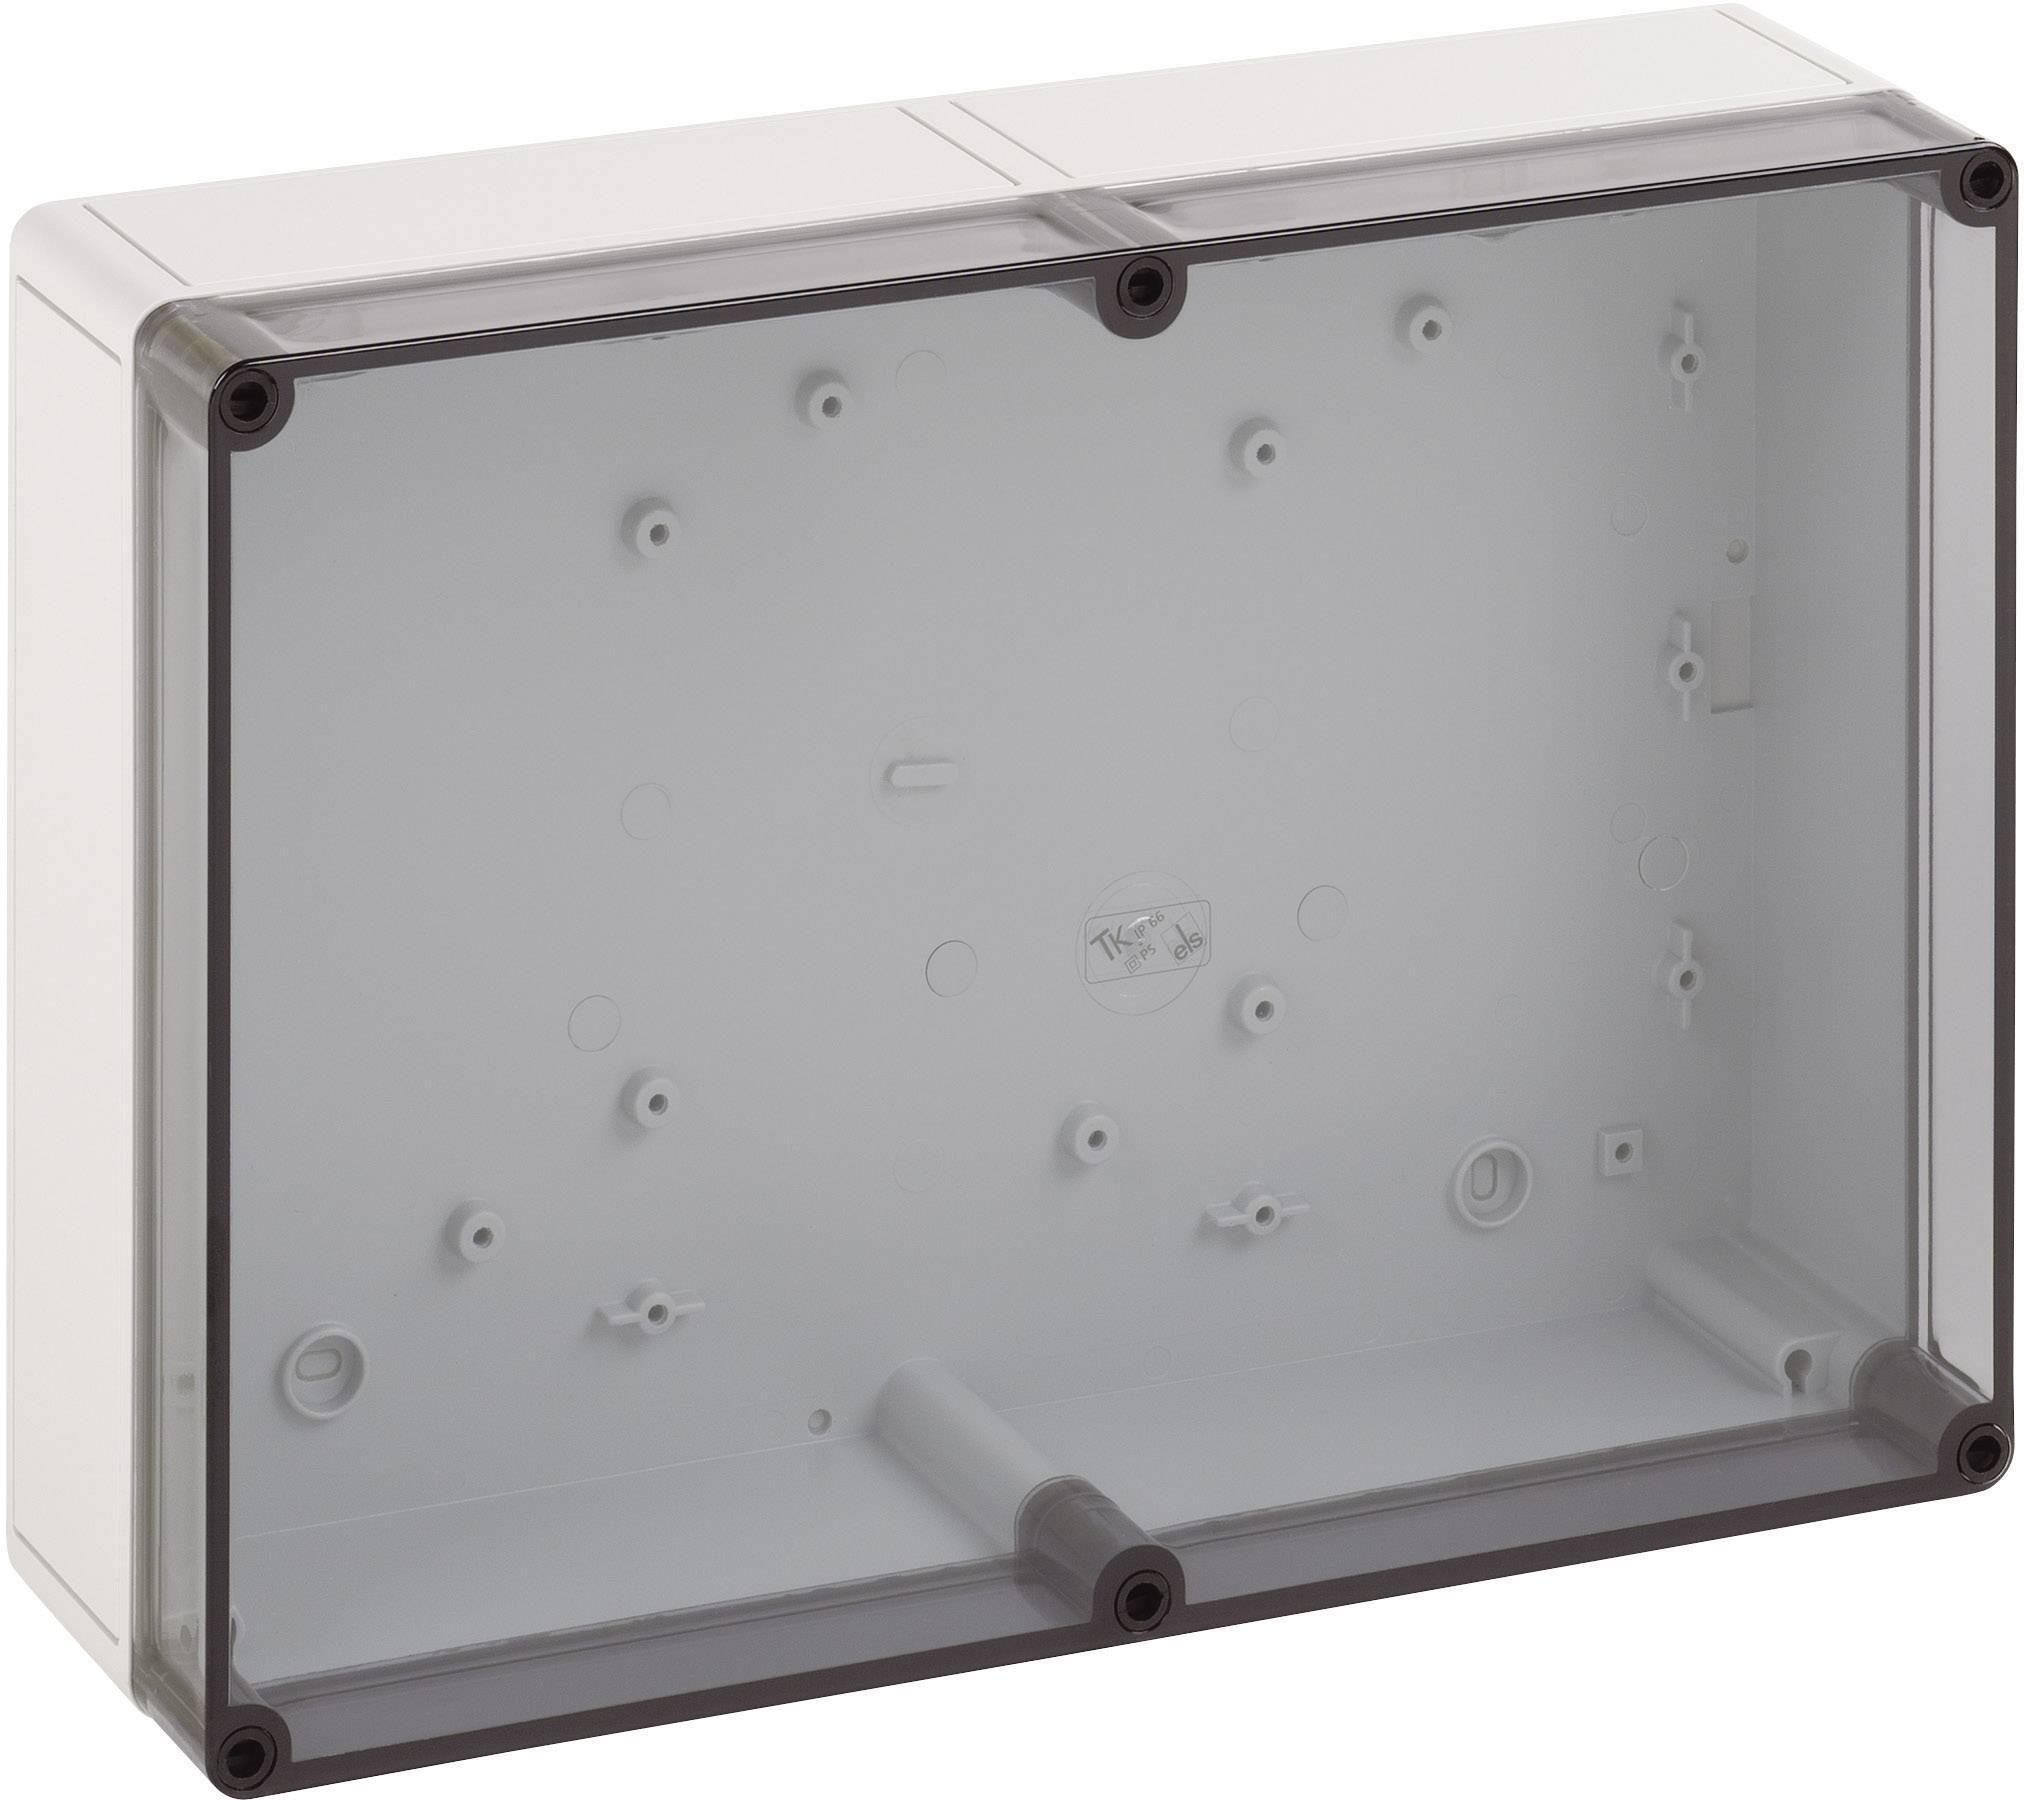 Instalační krabička Spelsberg TK PS 1811-6f-t, (d x š x v) 180 x 110 x 63 mm, polykarbonát, polystyren (EPS), šedá, 1 ks